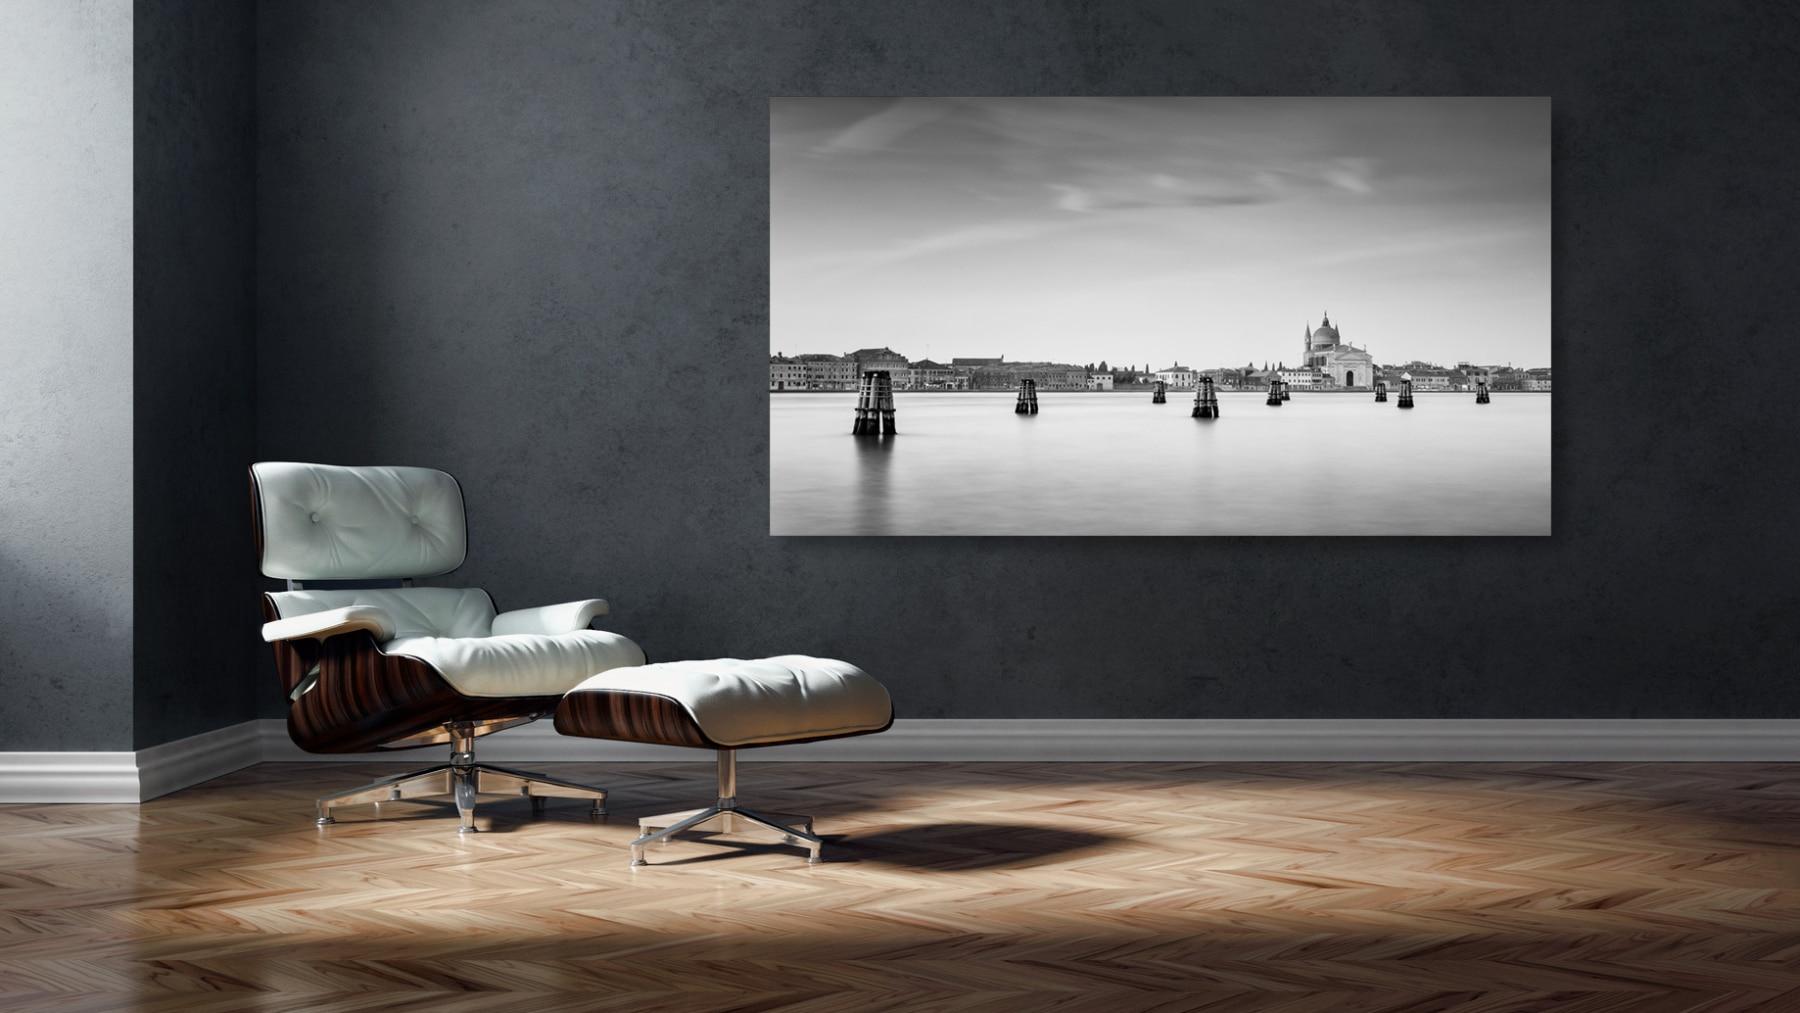 Italien, Venedig, Chiesa del Redentore, schwarz weiss Studie